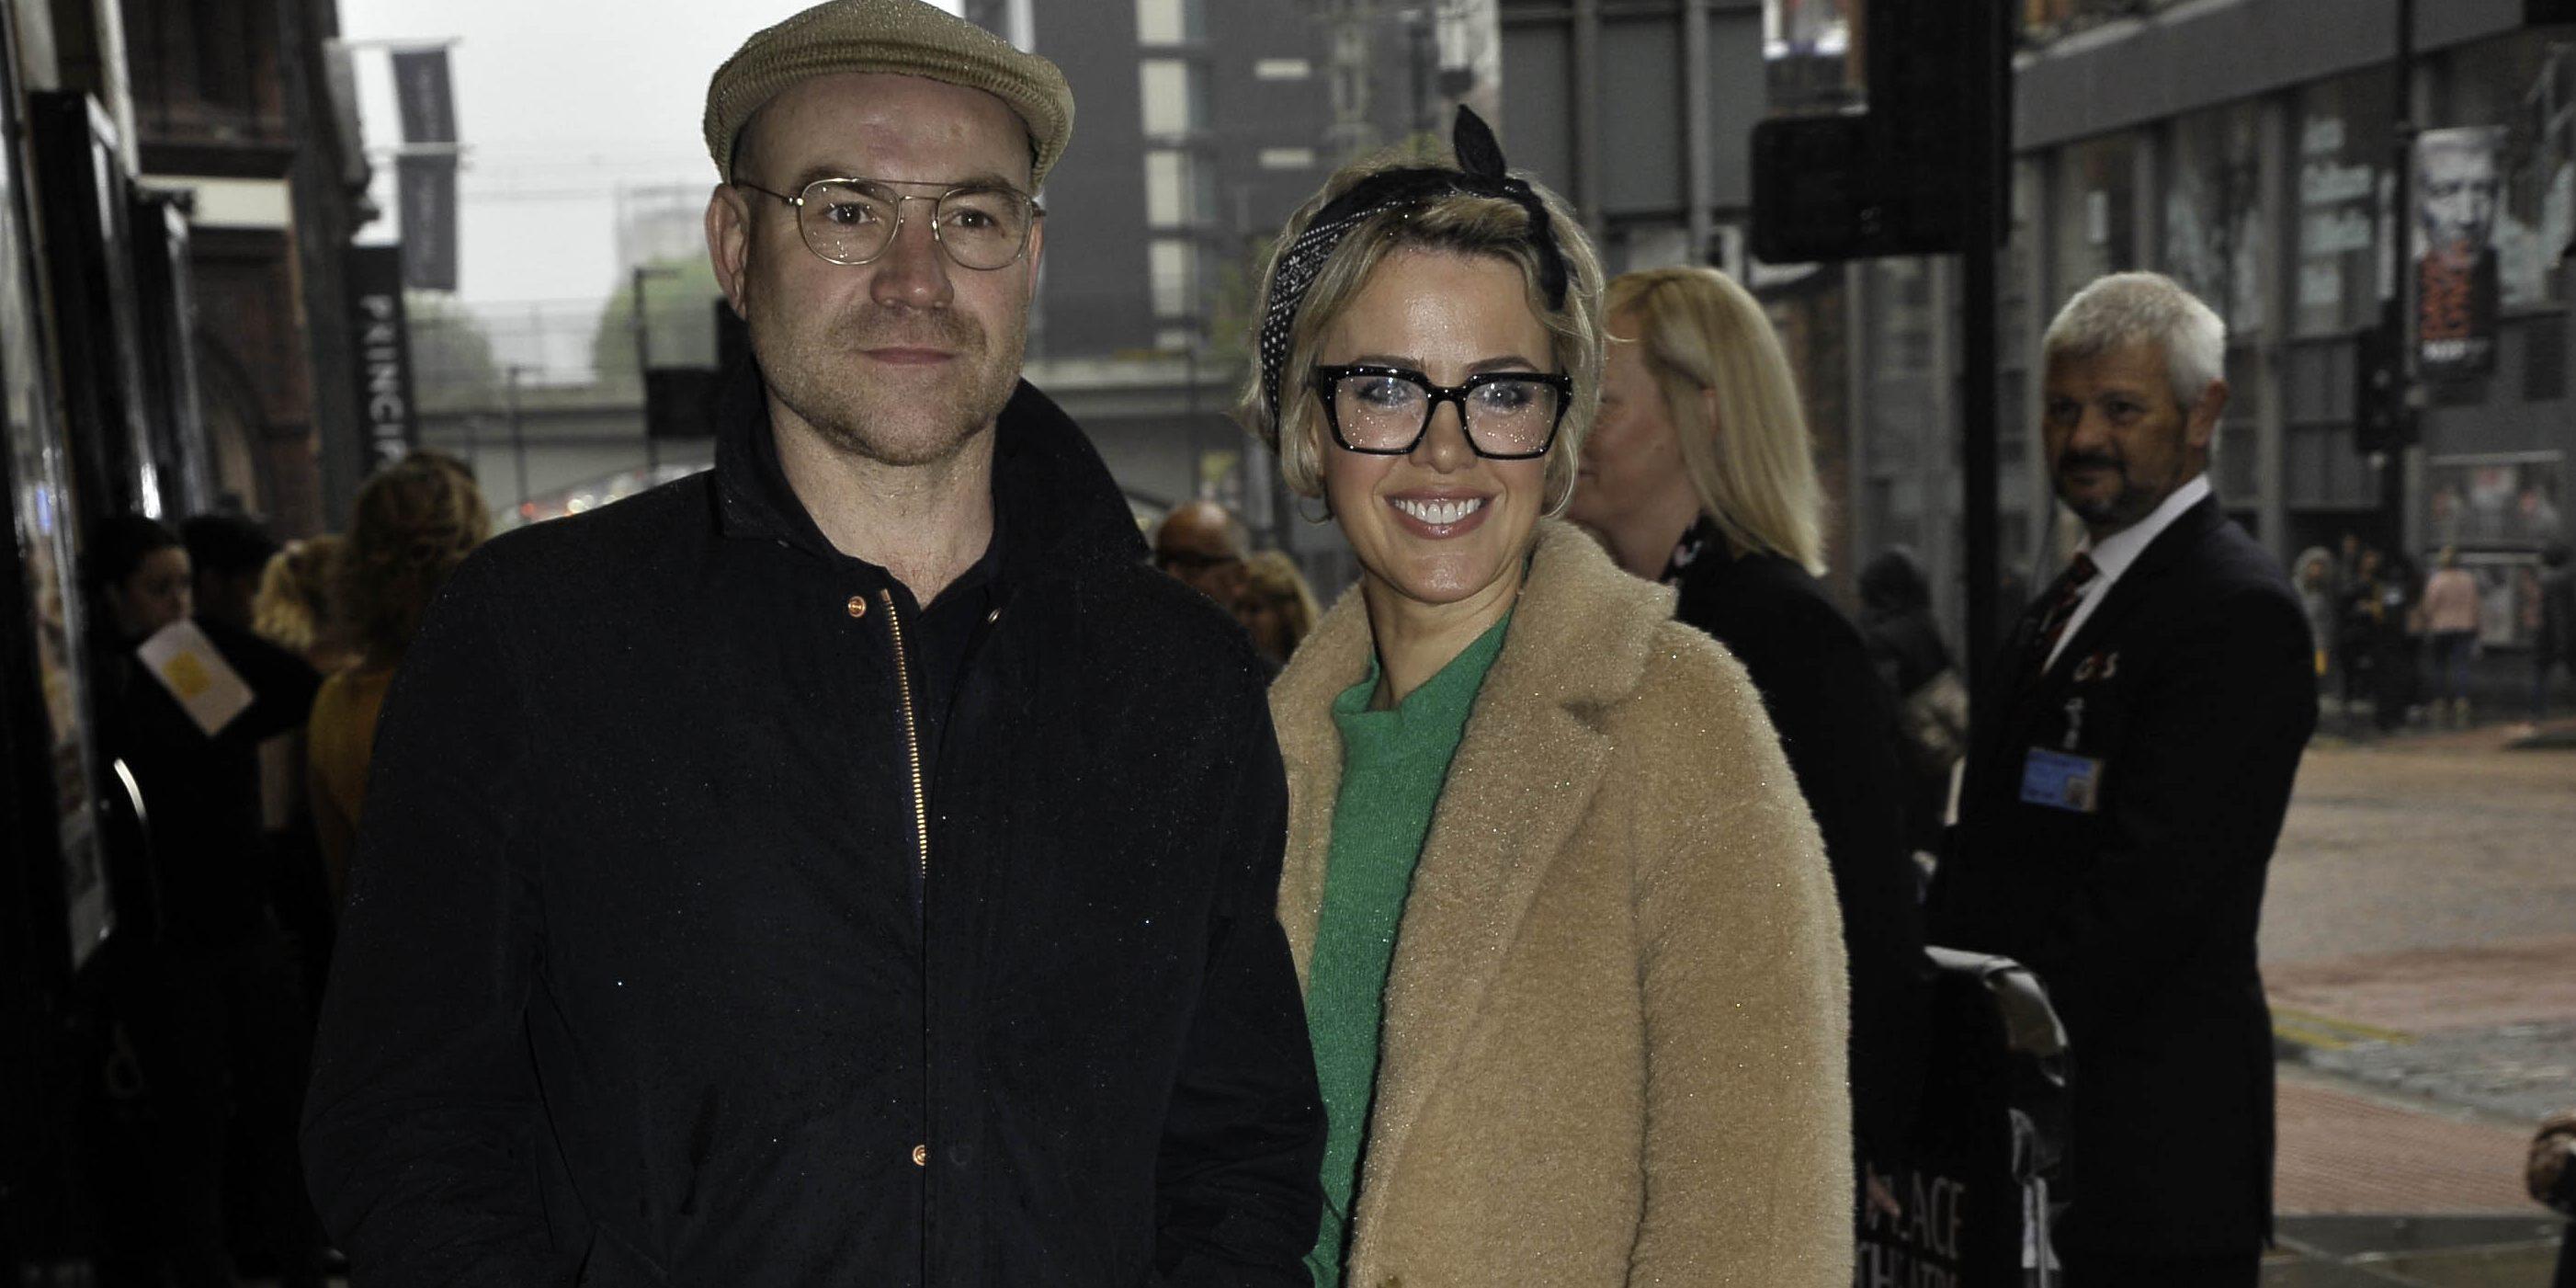 Coronation Street couple Joe Duttine and Sally Carman glam up for date night